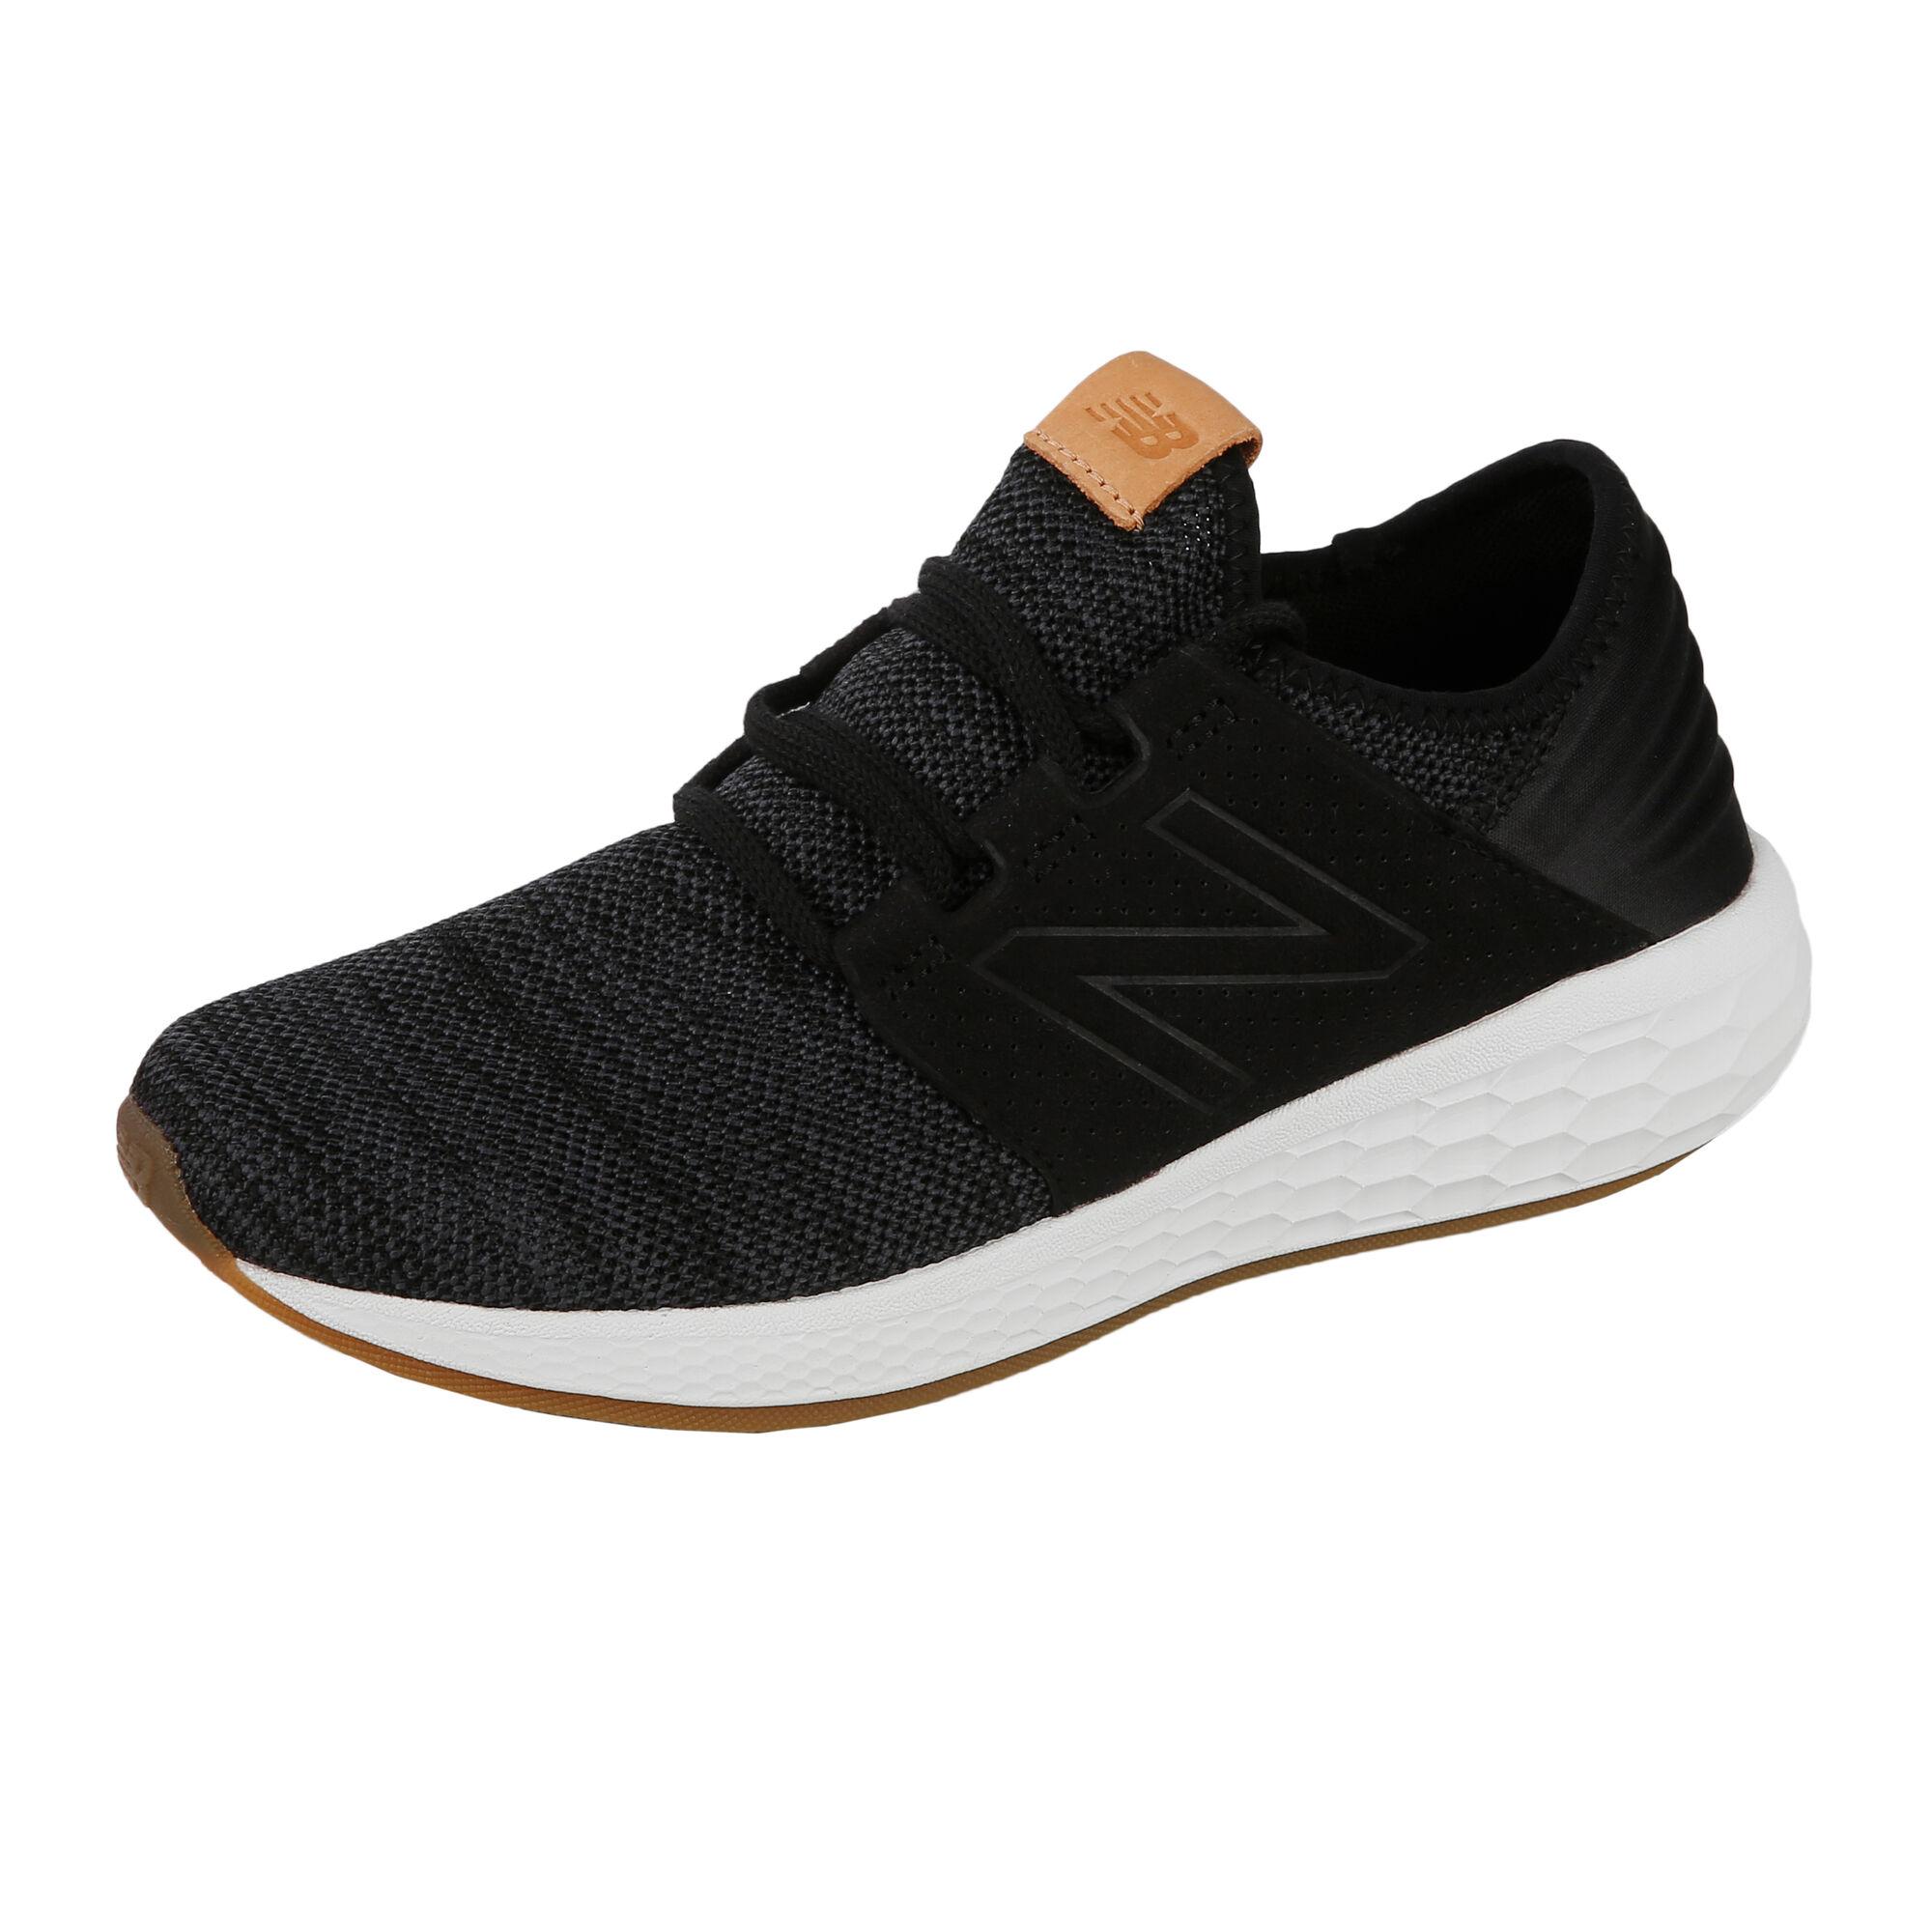 bf96c22e7857c buy New Balance Fresh Foam Cruz V2 Knit Neutral Running Shoe Women ...